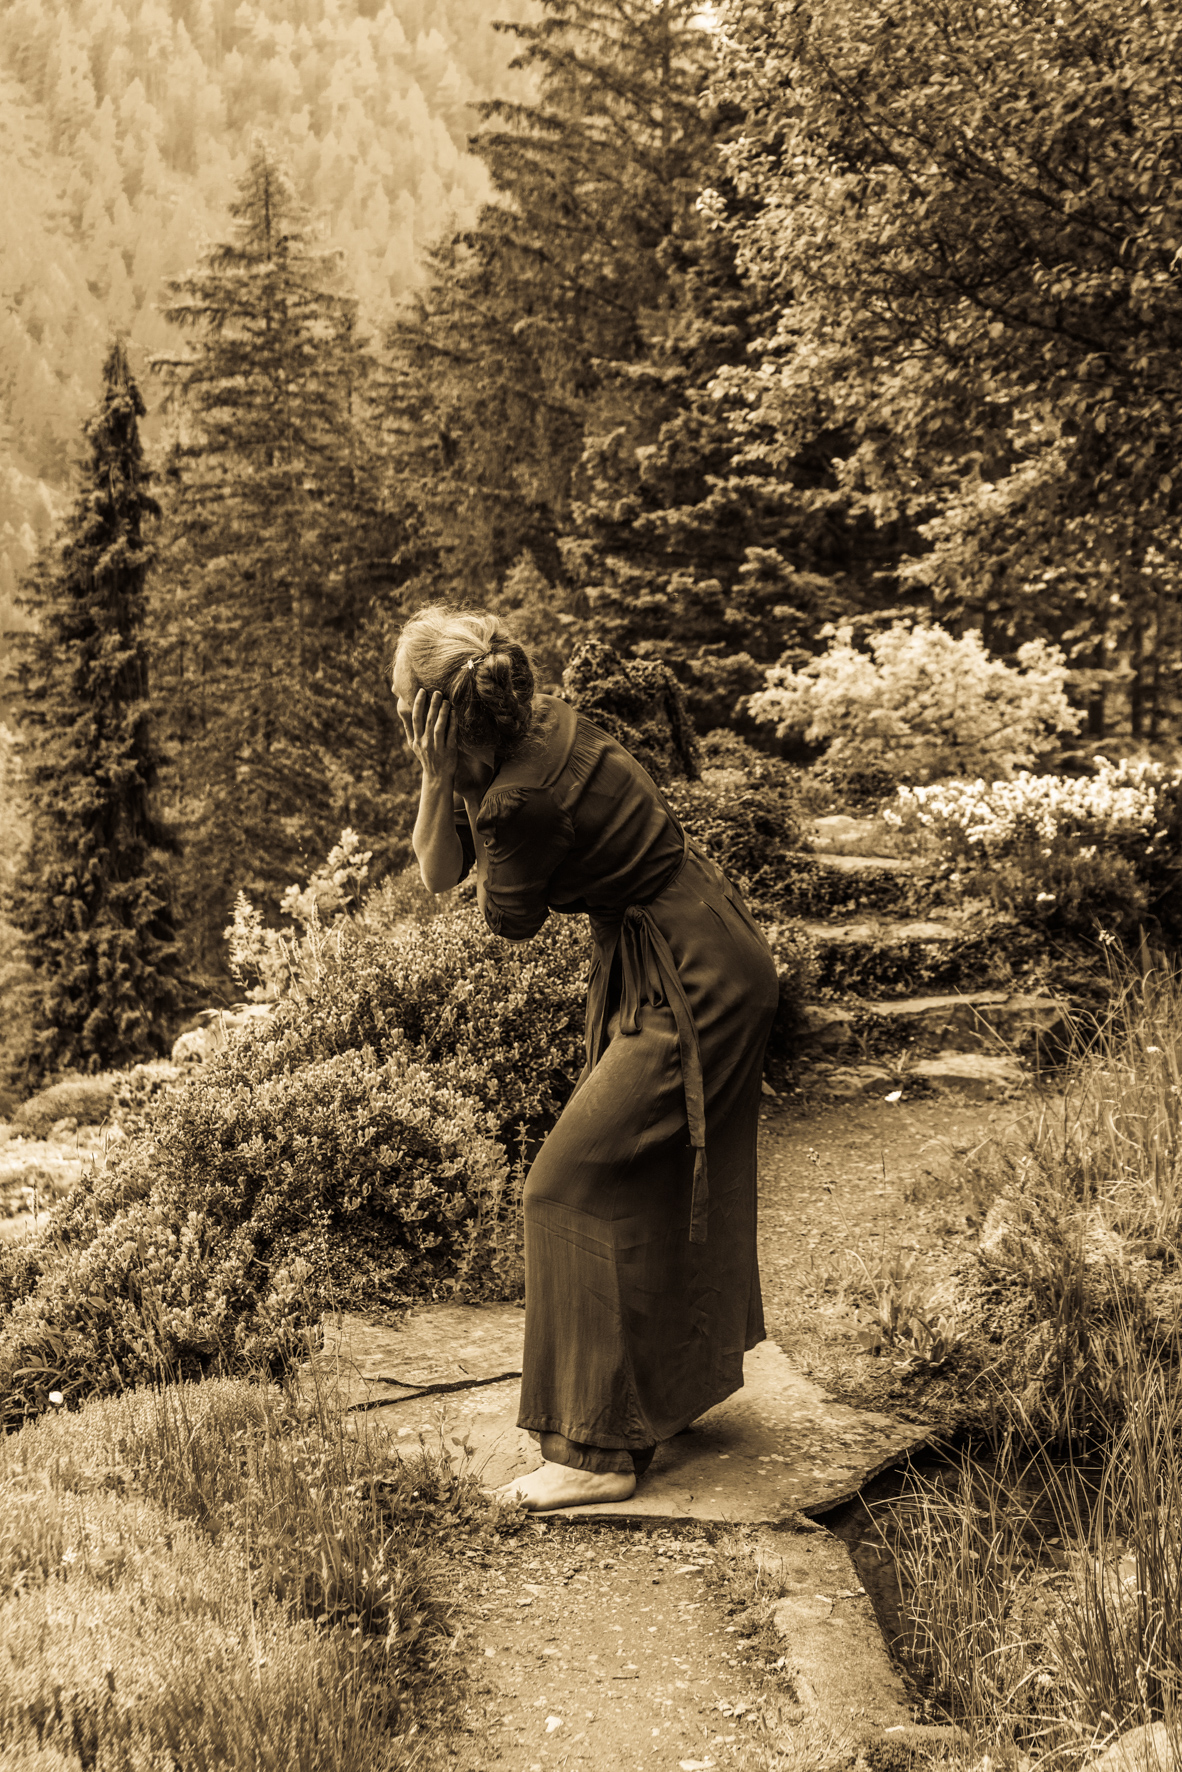 19062021-Flore-Alpe-30258